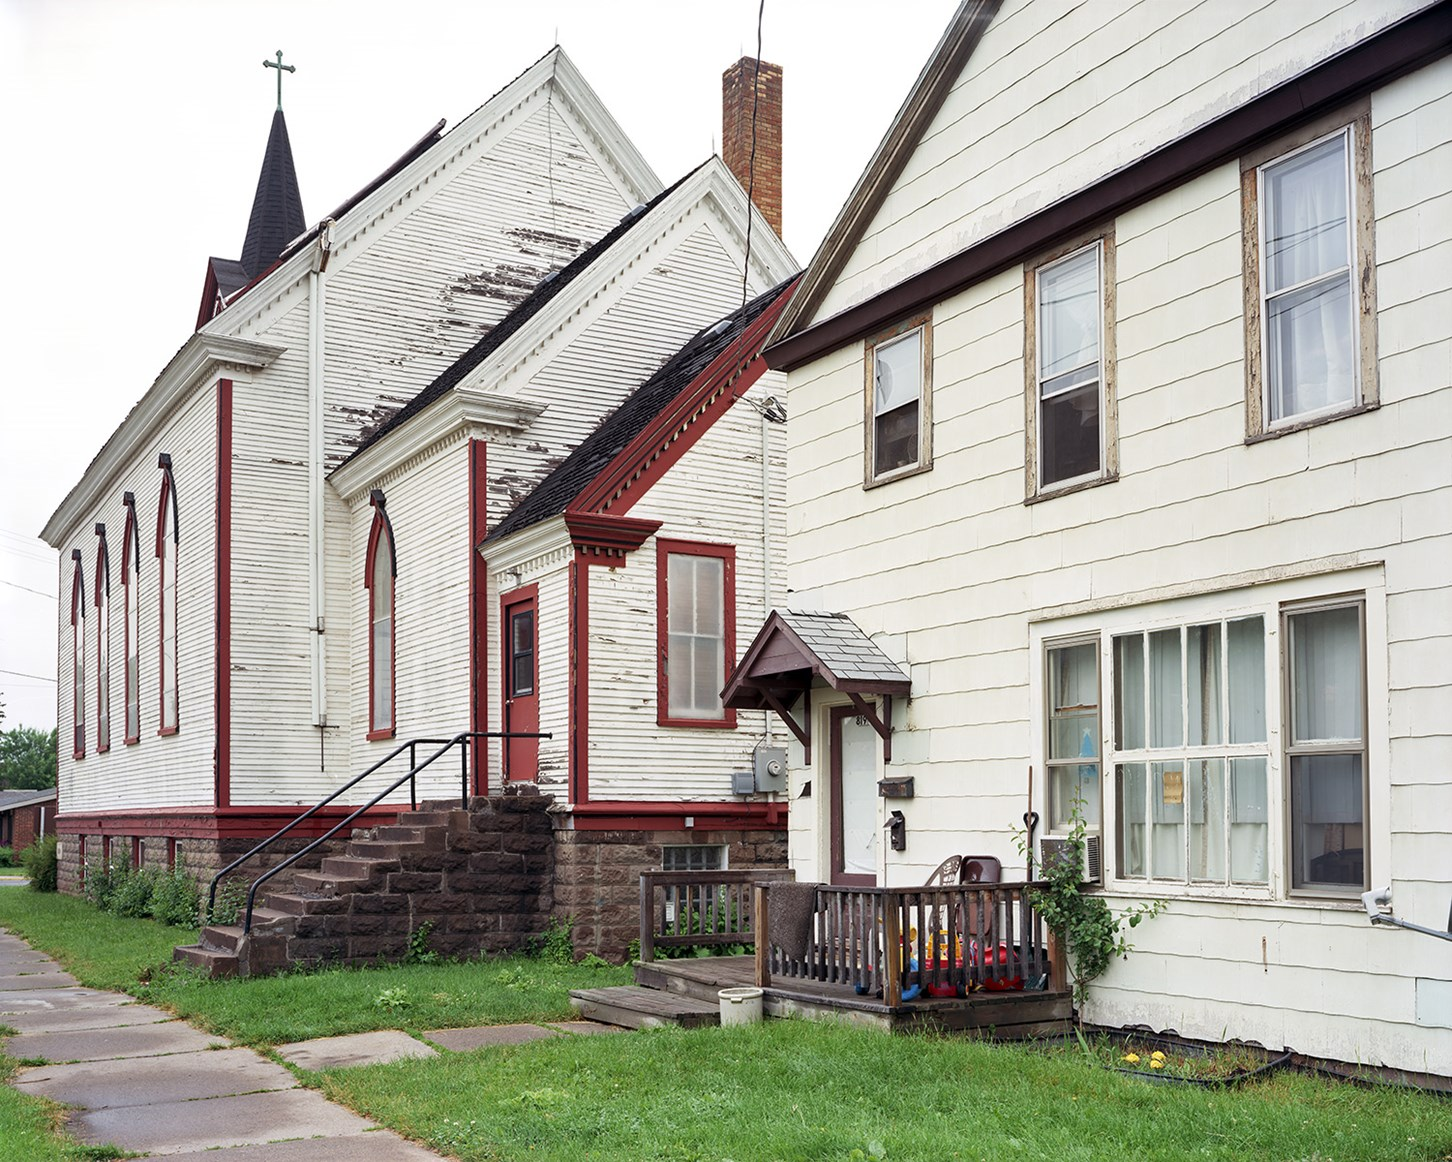 3rd Street, Ashland, Wisconsin, July 2013